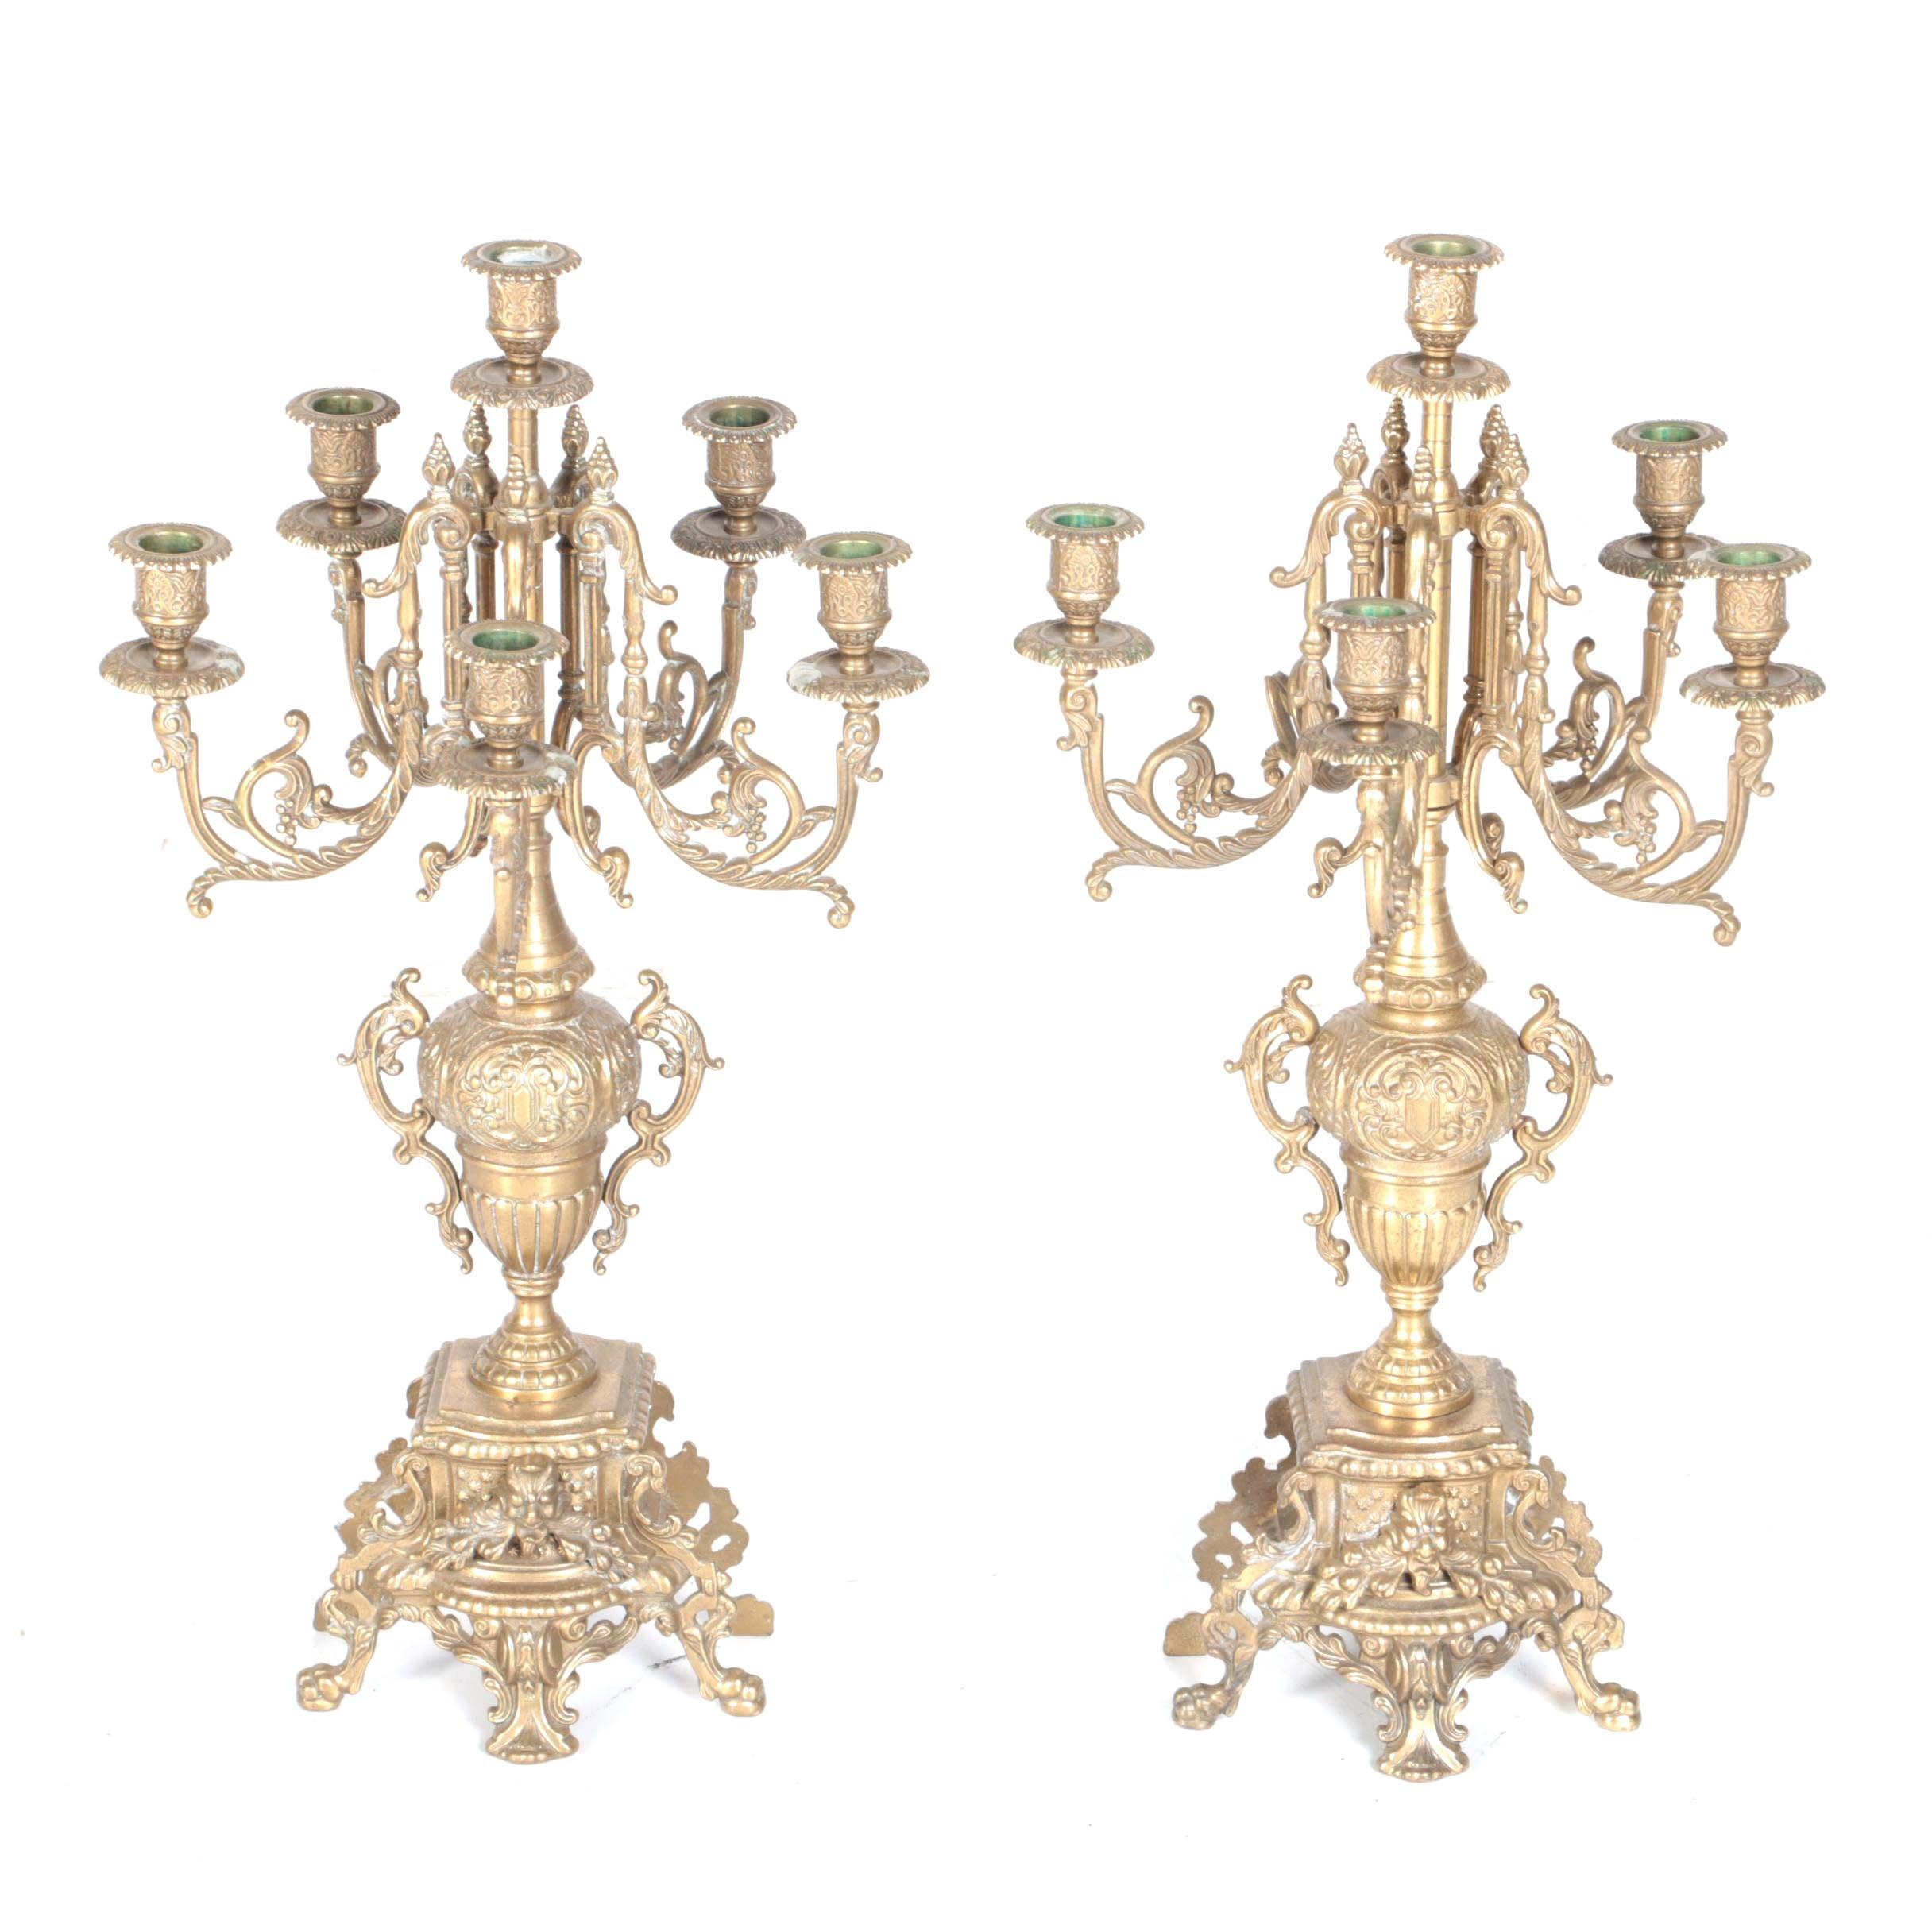 Vintage Brass Victorian-Style Girandoles